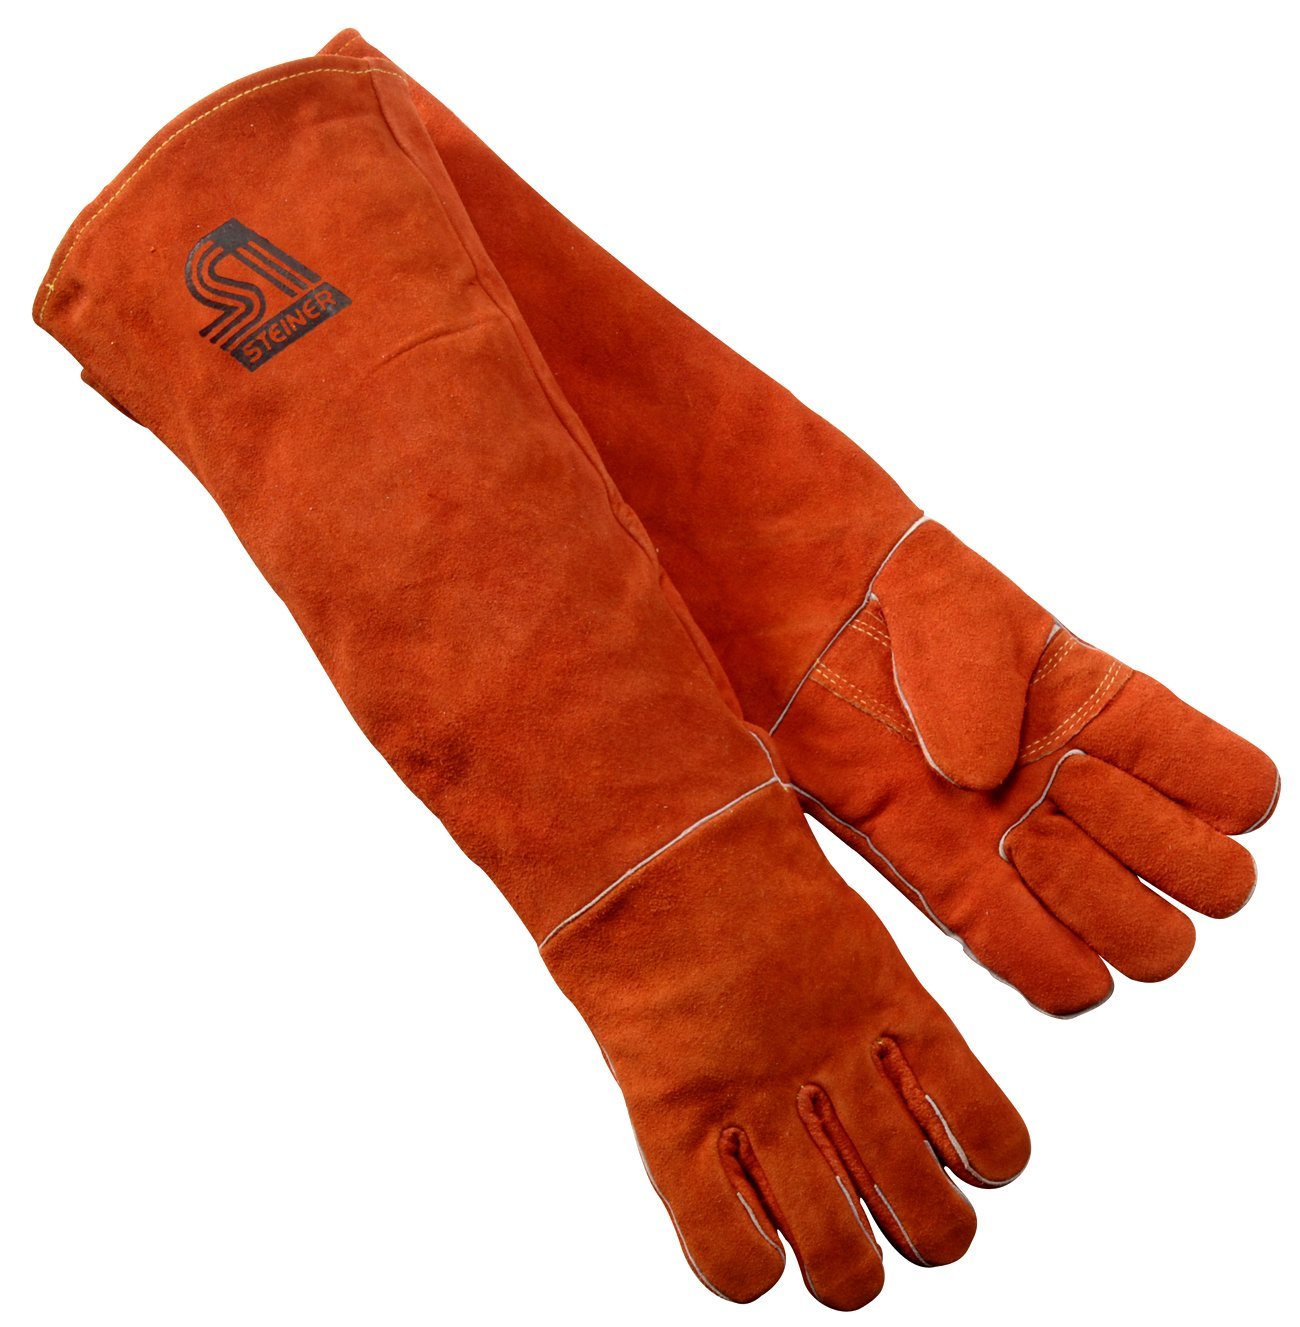 Steiner 21923 L Welding Gloves Burnt orange Y Series 23 Inch Length Shoulder Split Cowhide Foam Lined Large